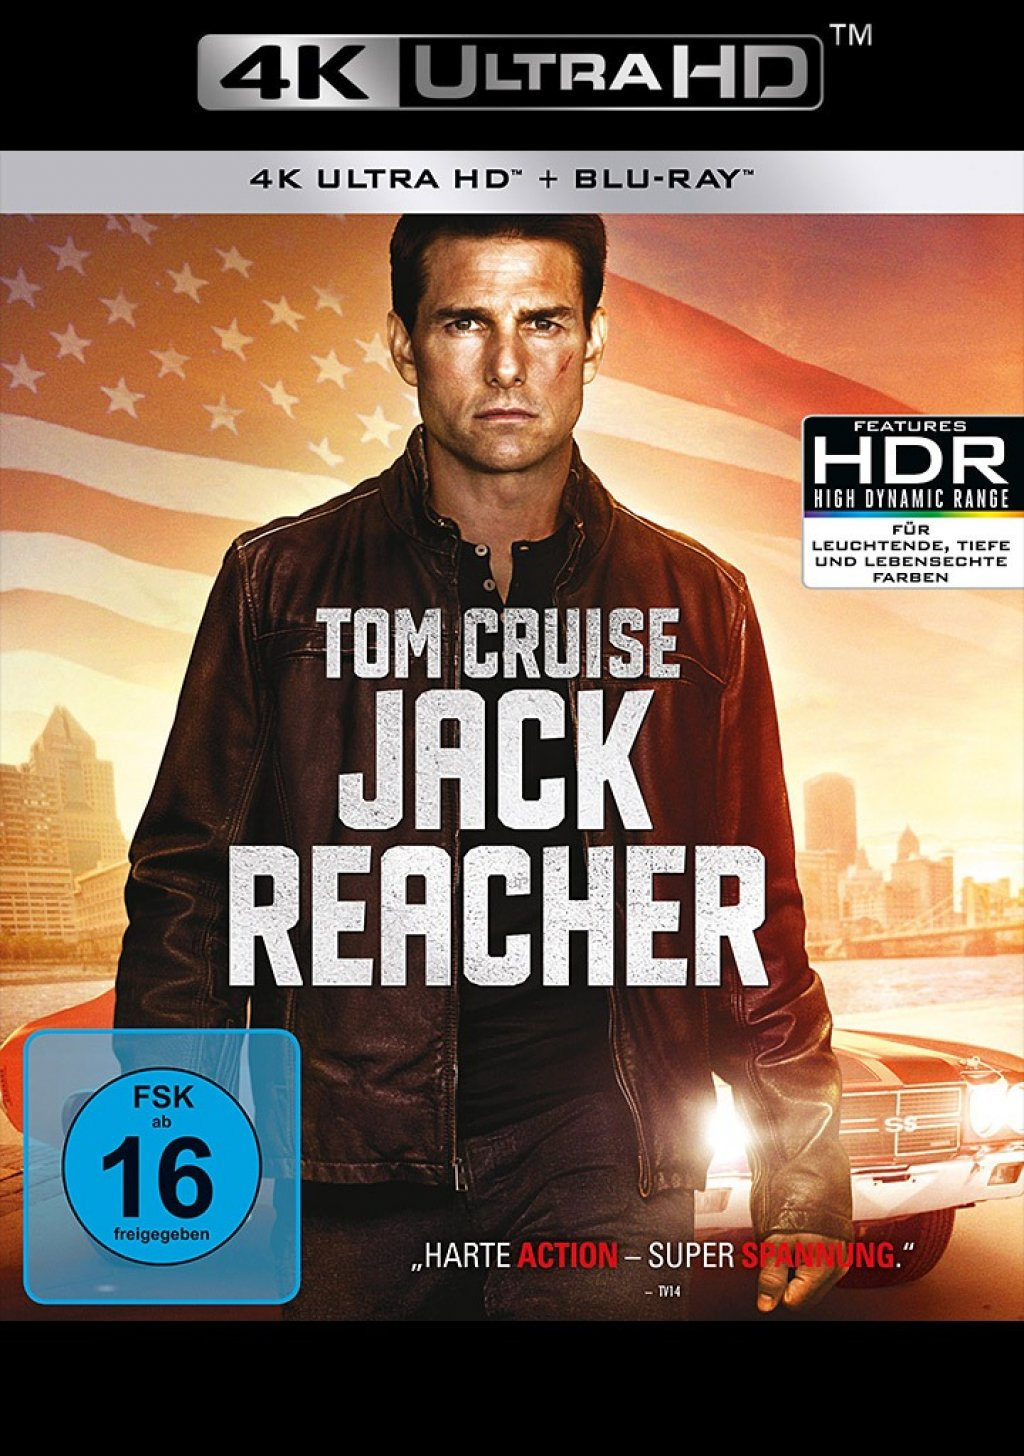 Jack Reacher - 4K Ultra HD Blu-ray + Blu-ray (4K Ultra HD)